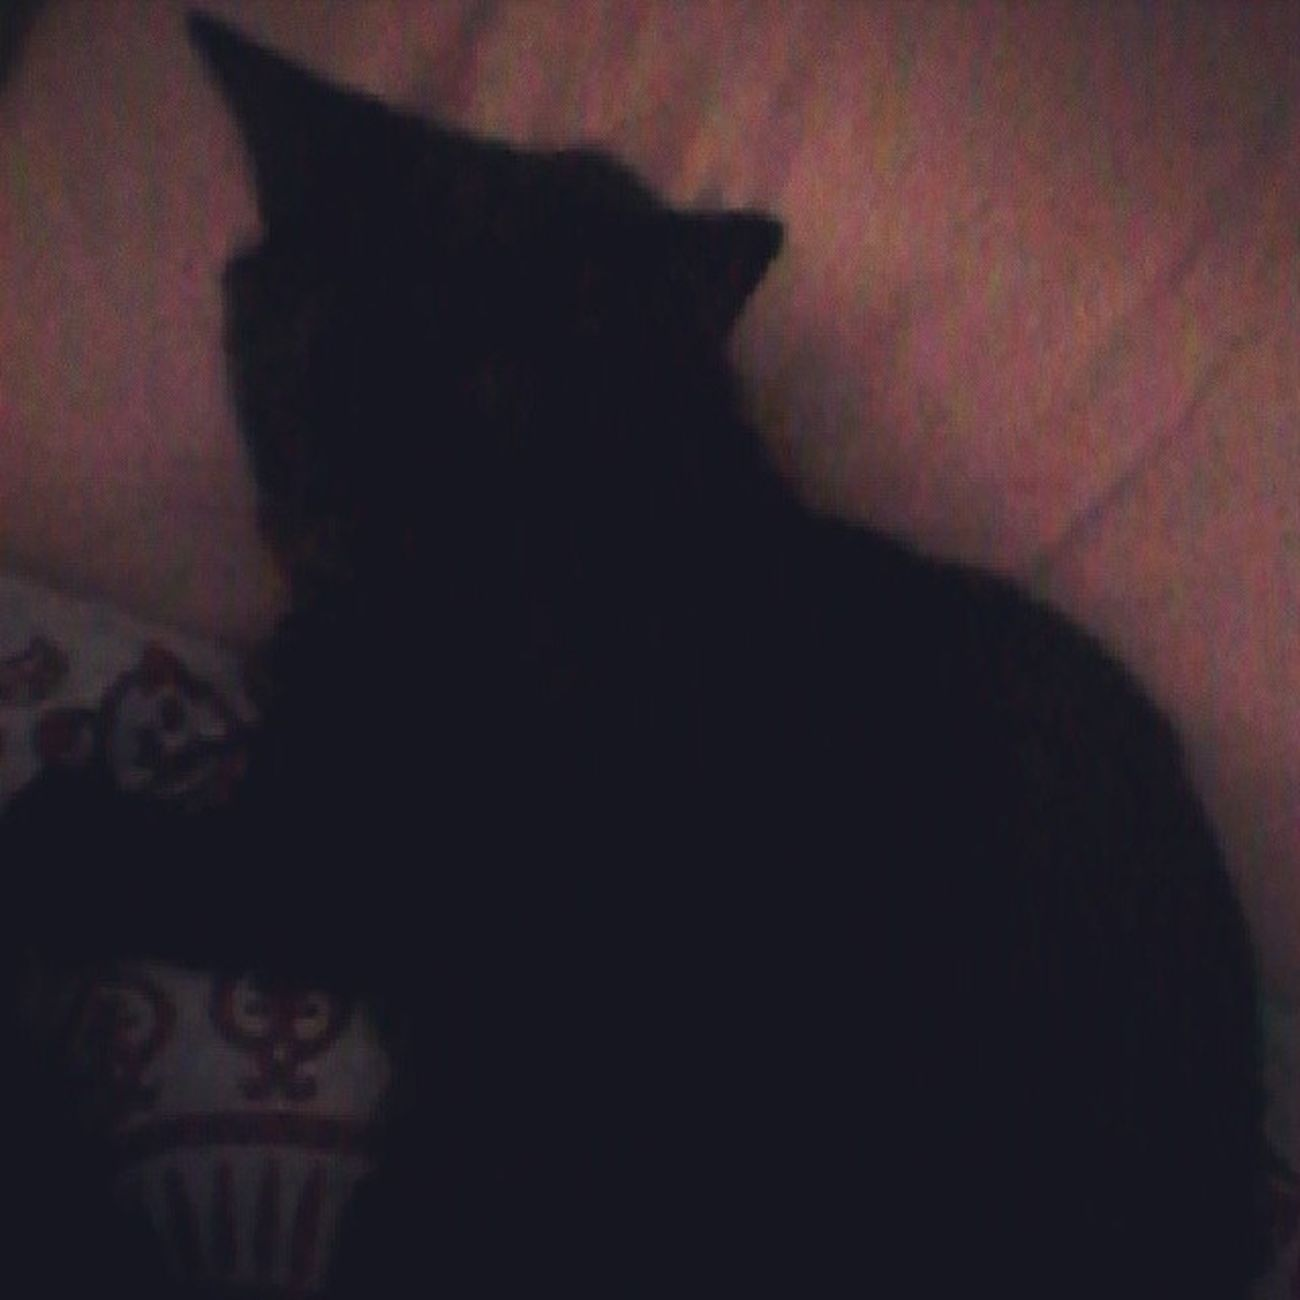 Bagheerah Catsofinstagram Lazycatdaze Facelesscats familiar babyboy babypanther vicious blackcats